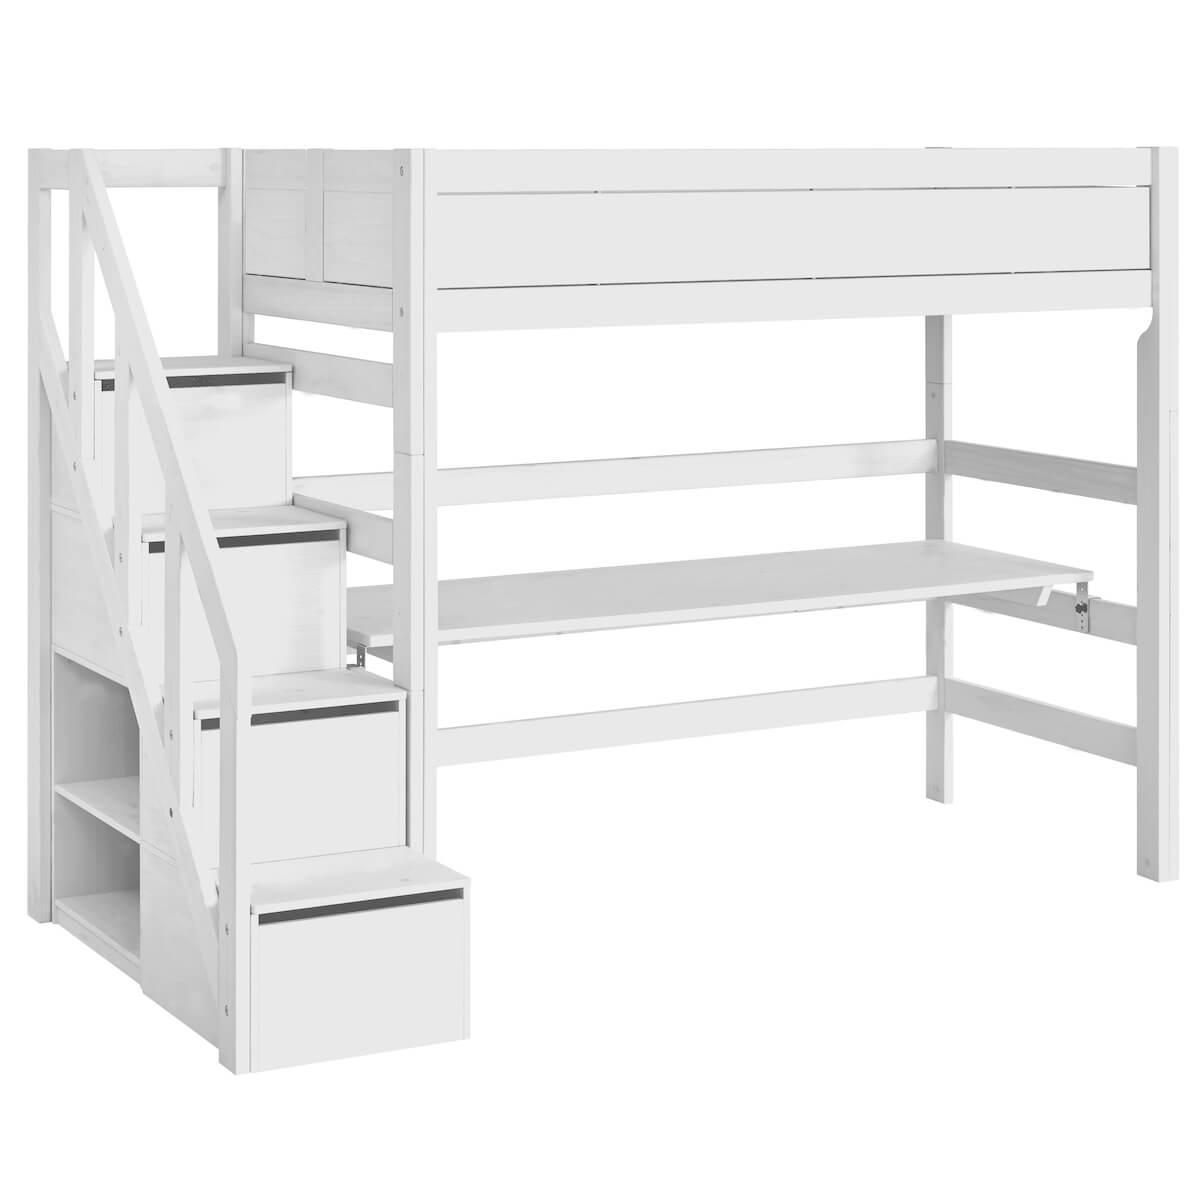 Cama alta 90x200cm escalera cajones Lifetime blanco